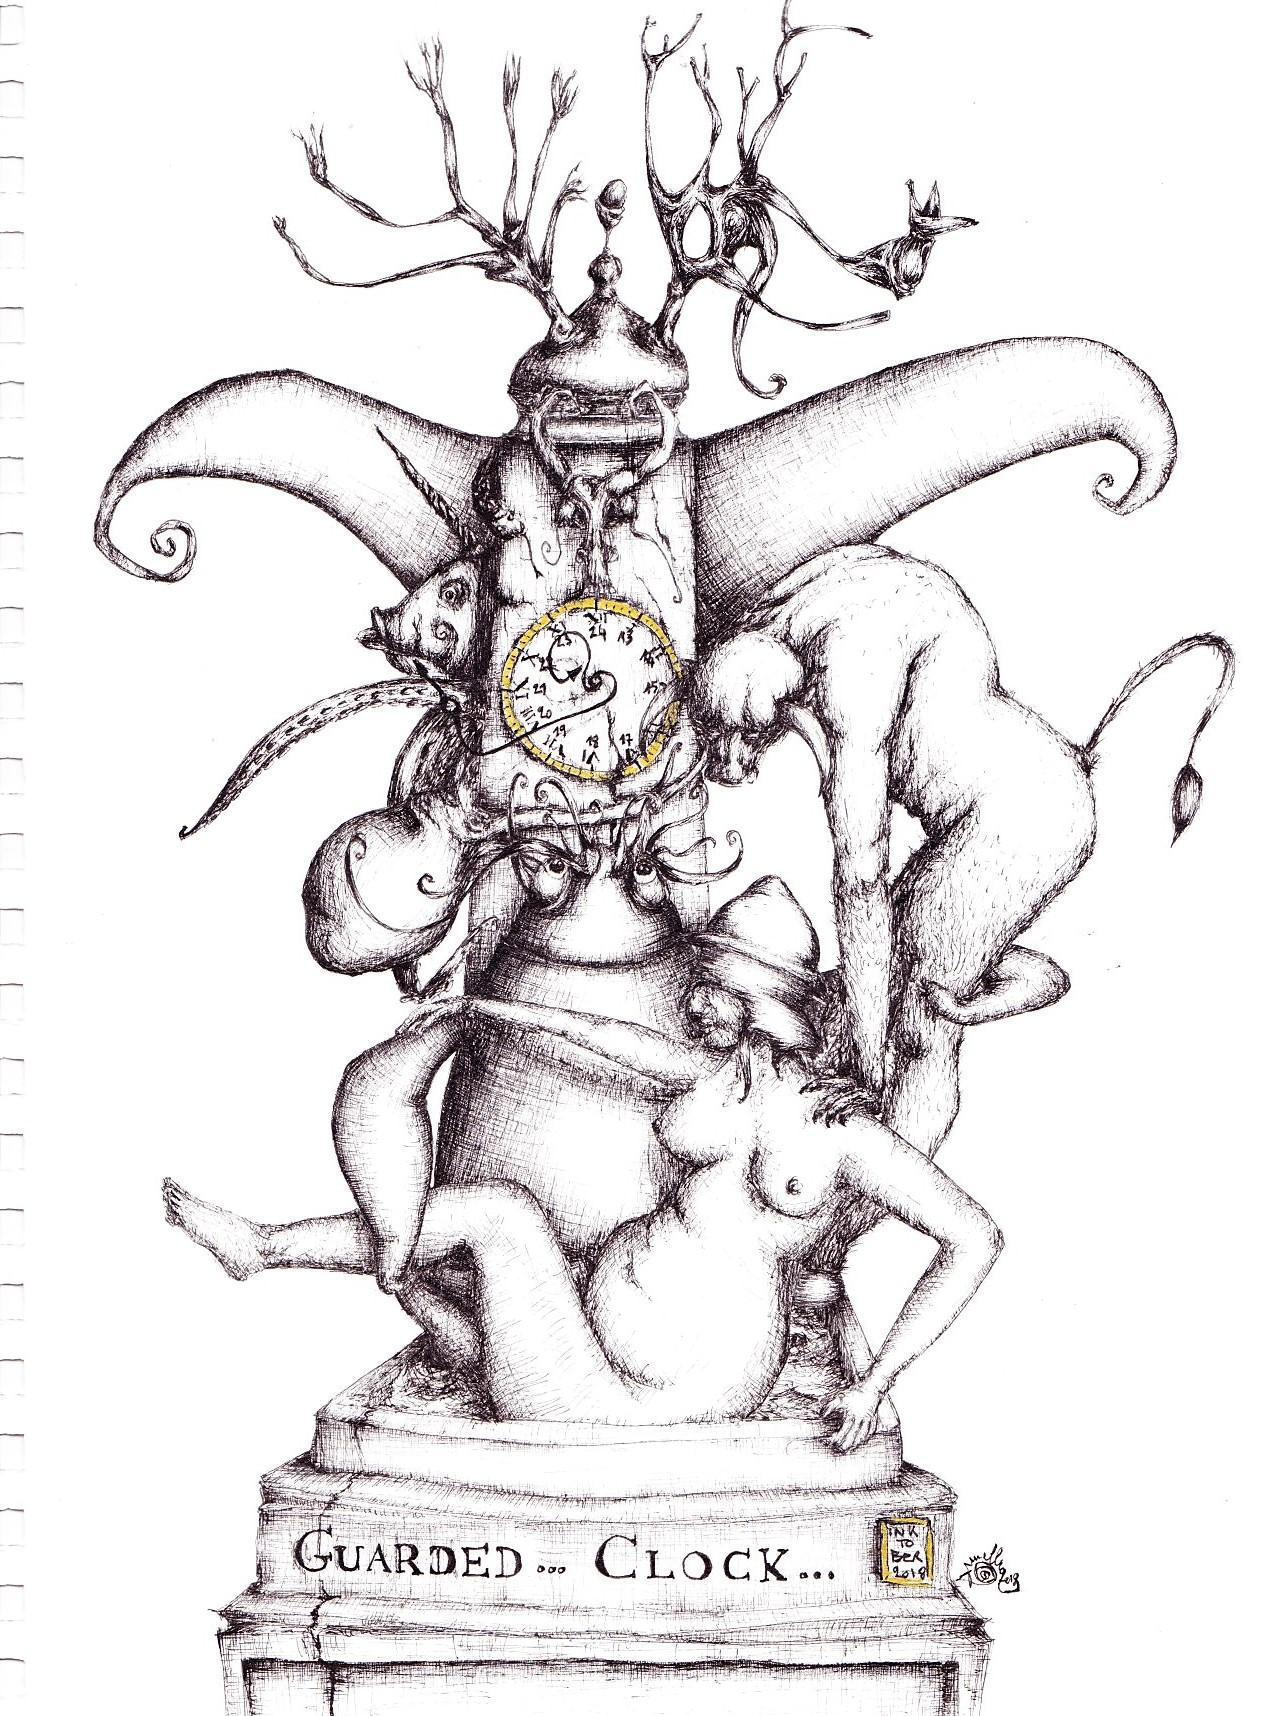 Guarder clock